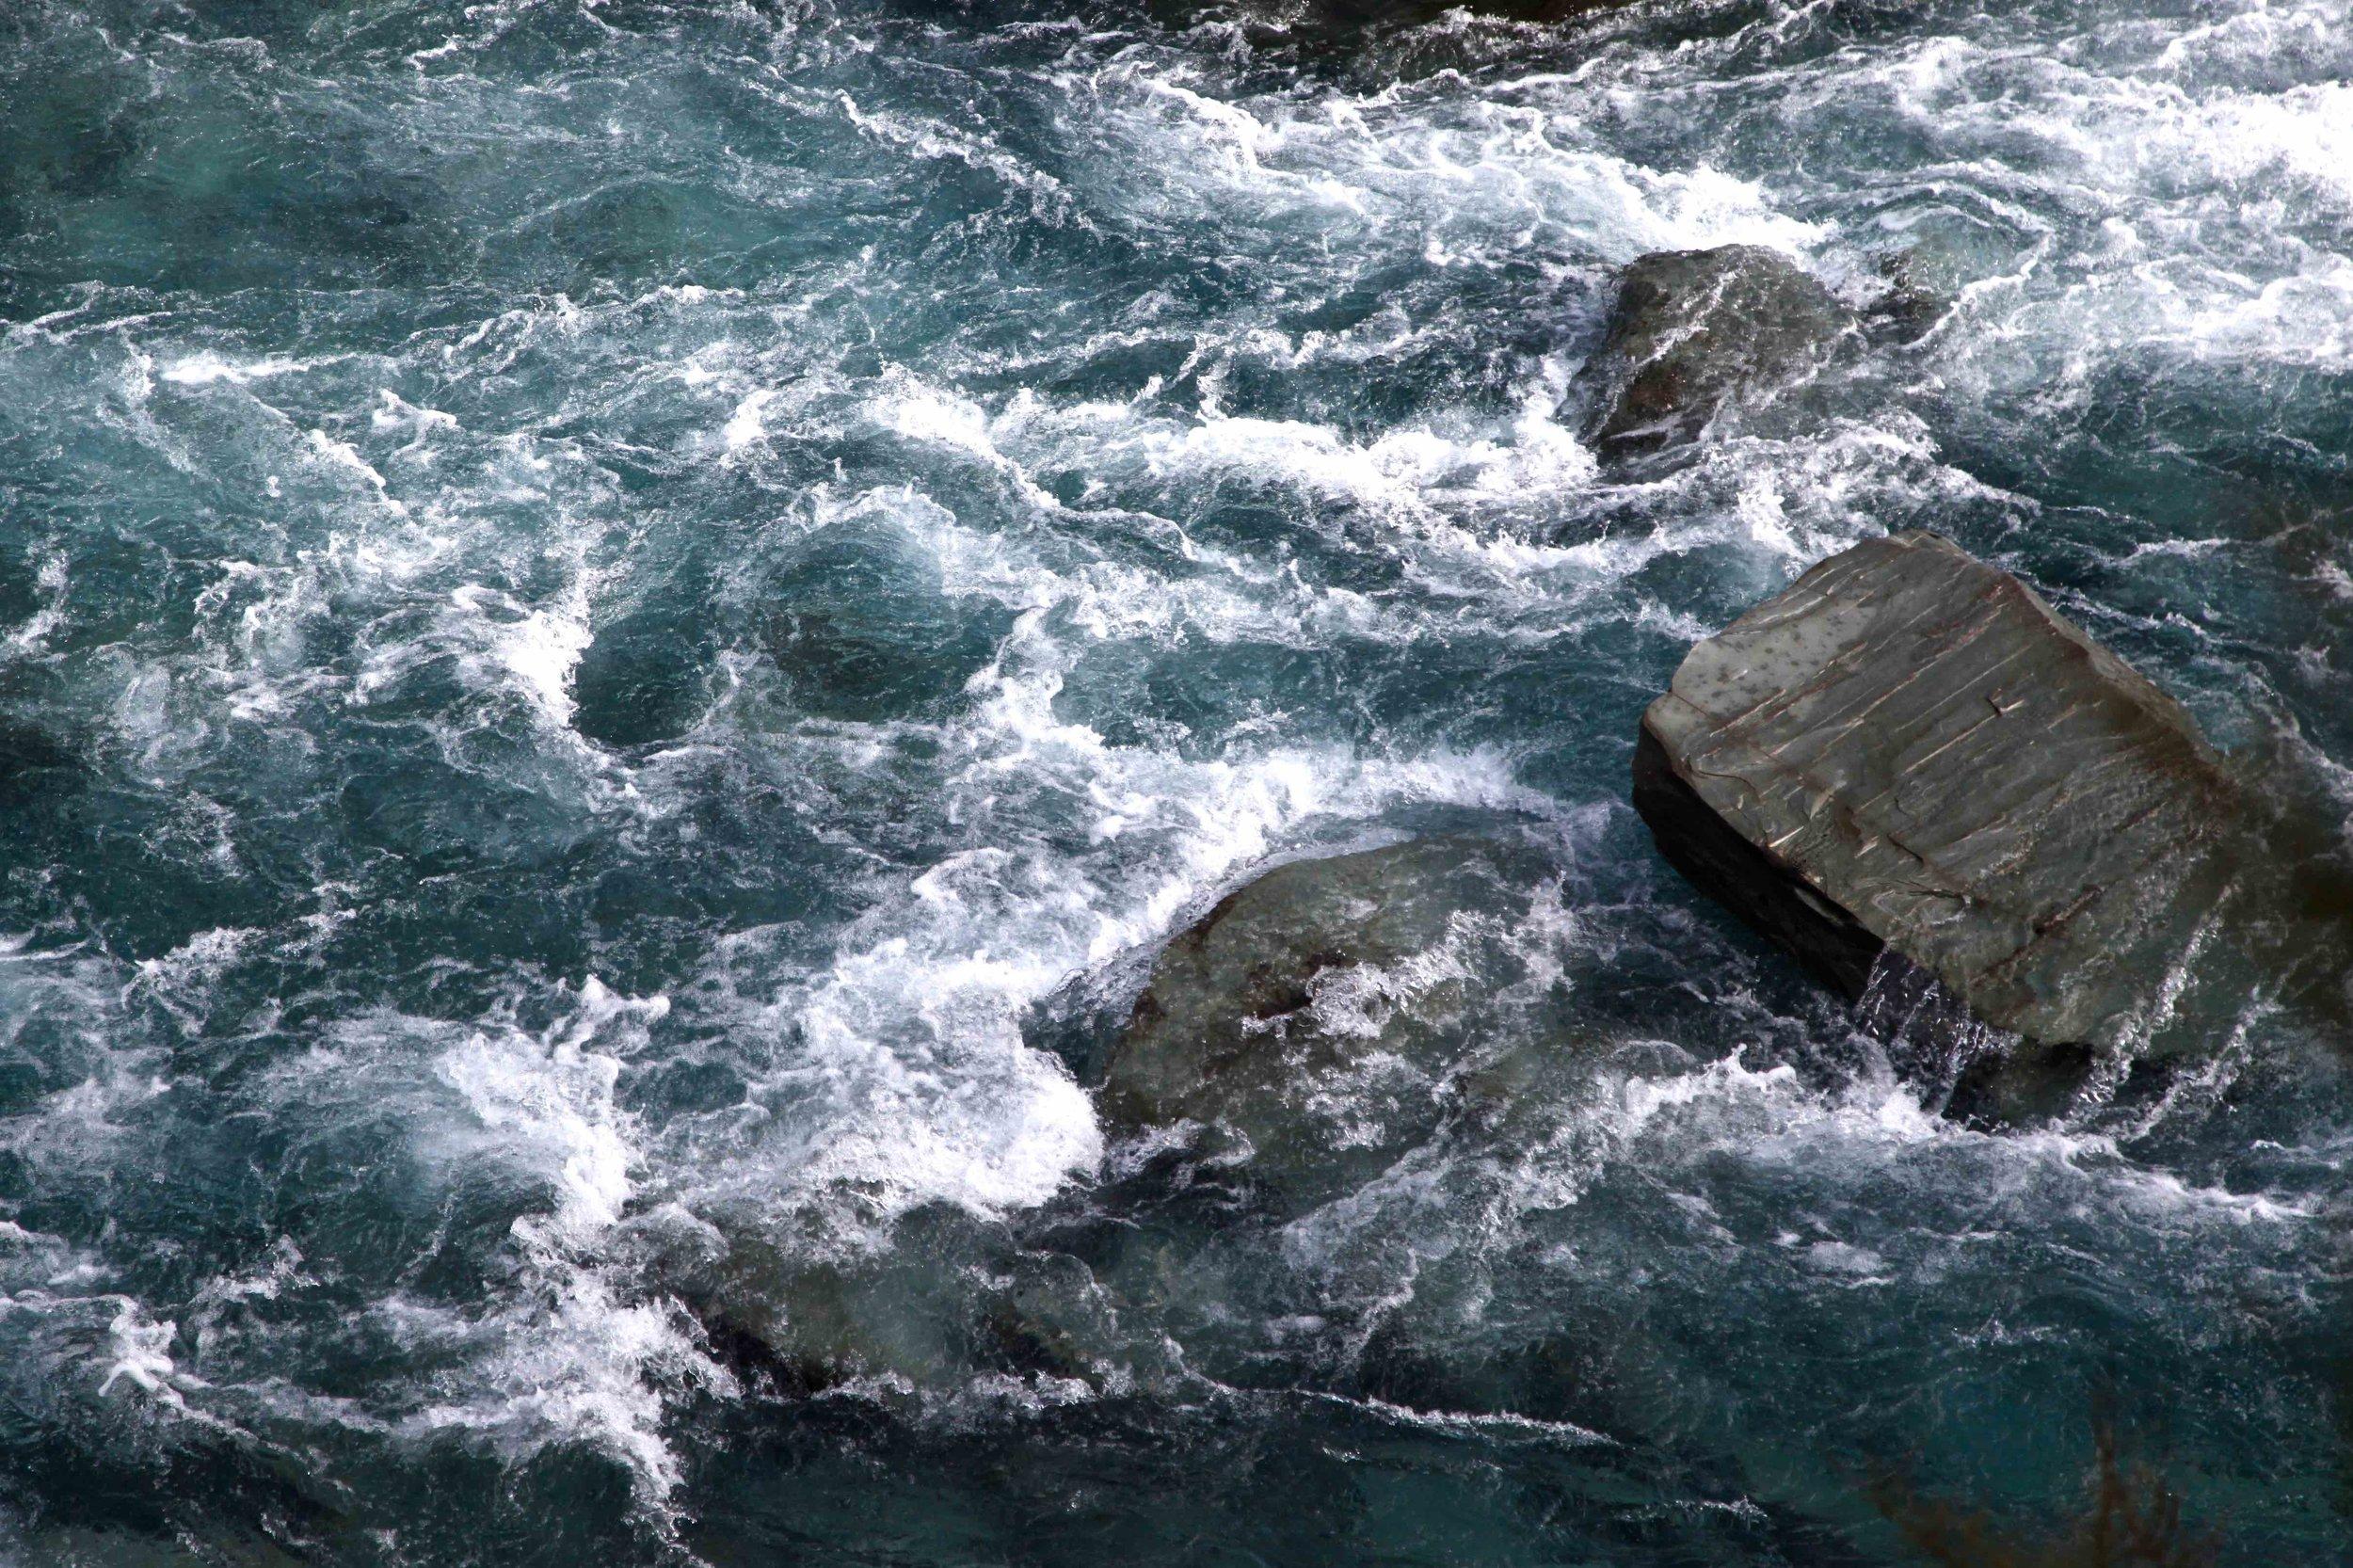 matukituki-river-mt-aspiring-national-park.jpg